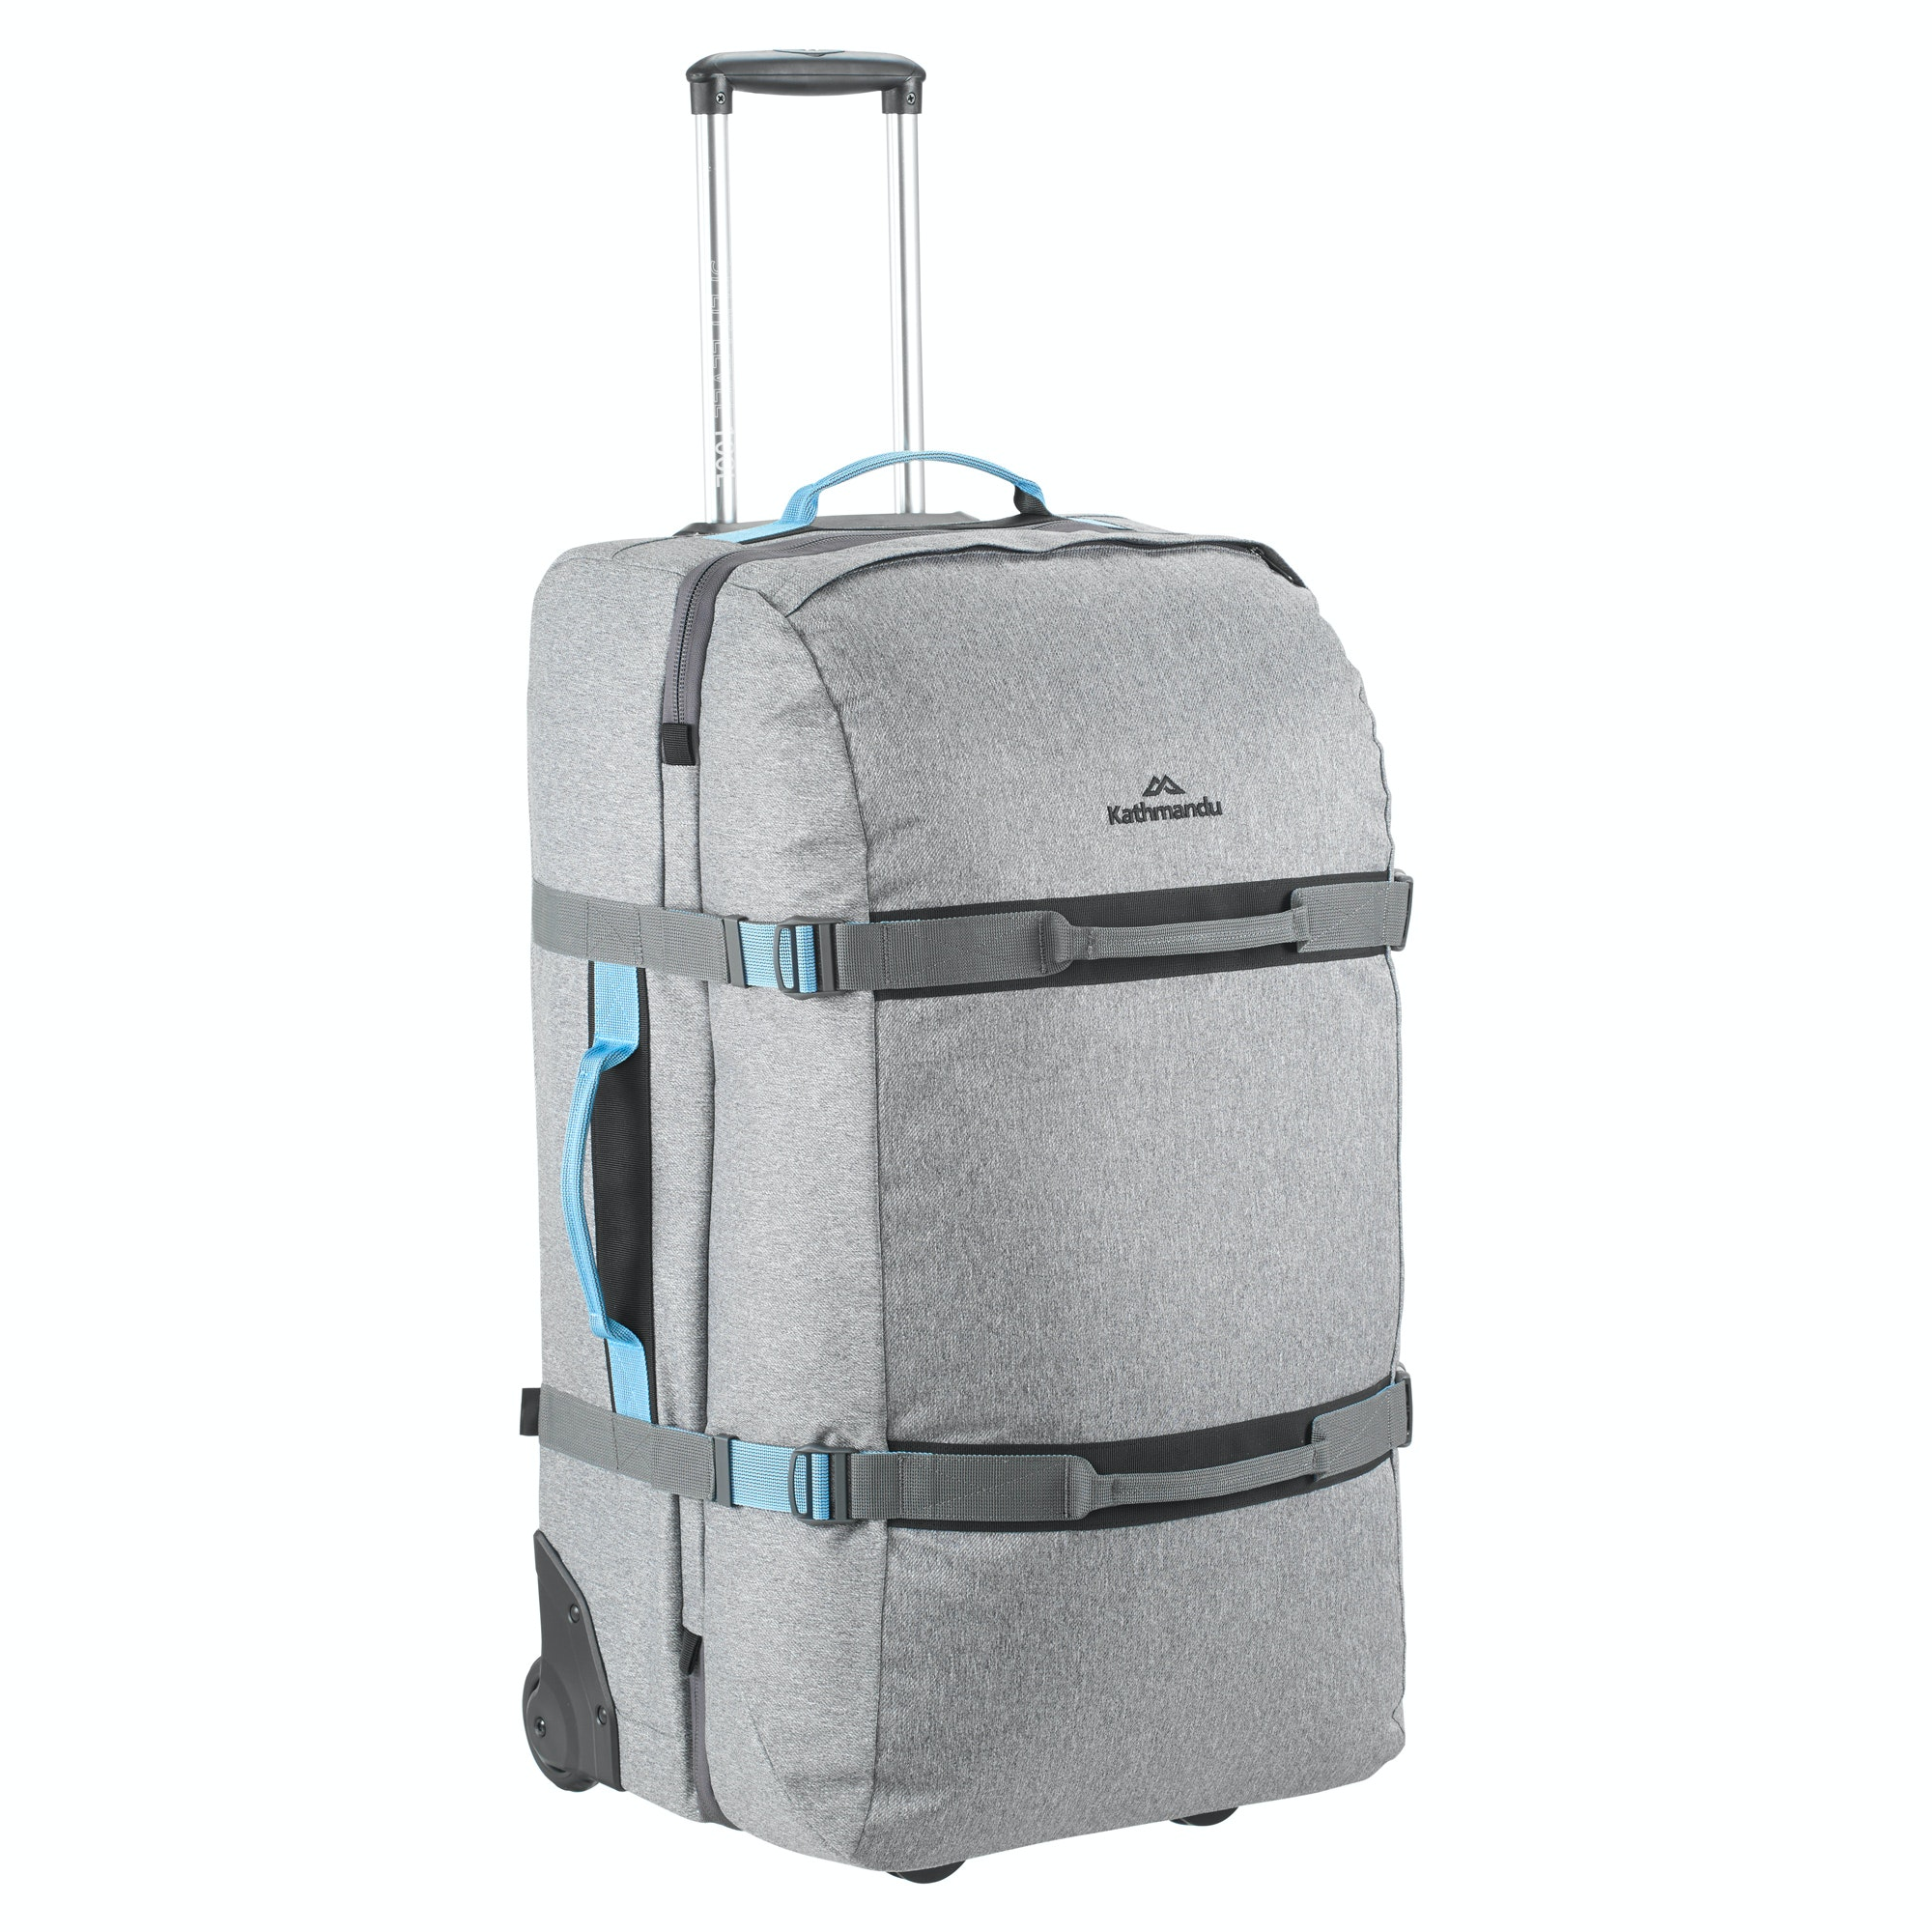 Split Level 100L Wheeled Luggage Trolley v2 - Black